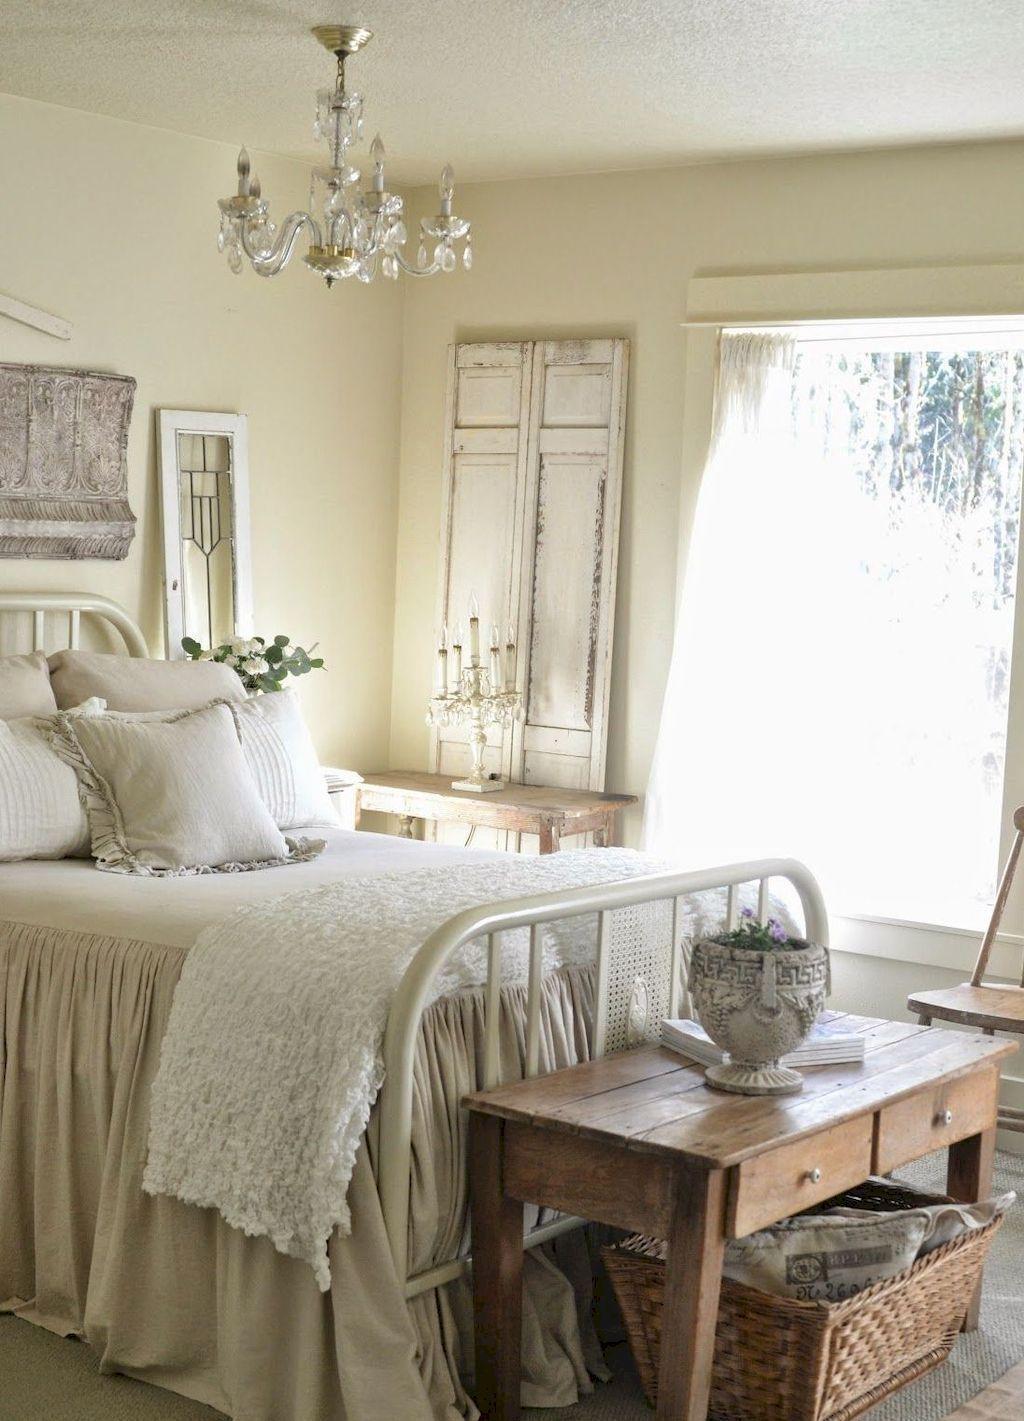 Adorable 70 Beautiful Farmhouse Master Bedroom Ideas